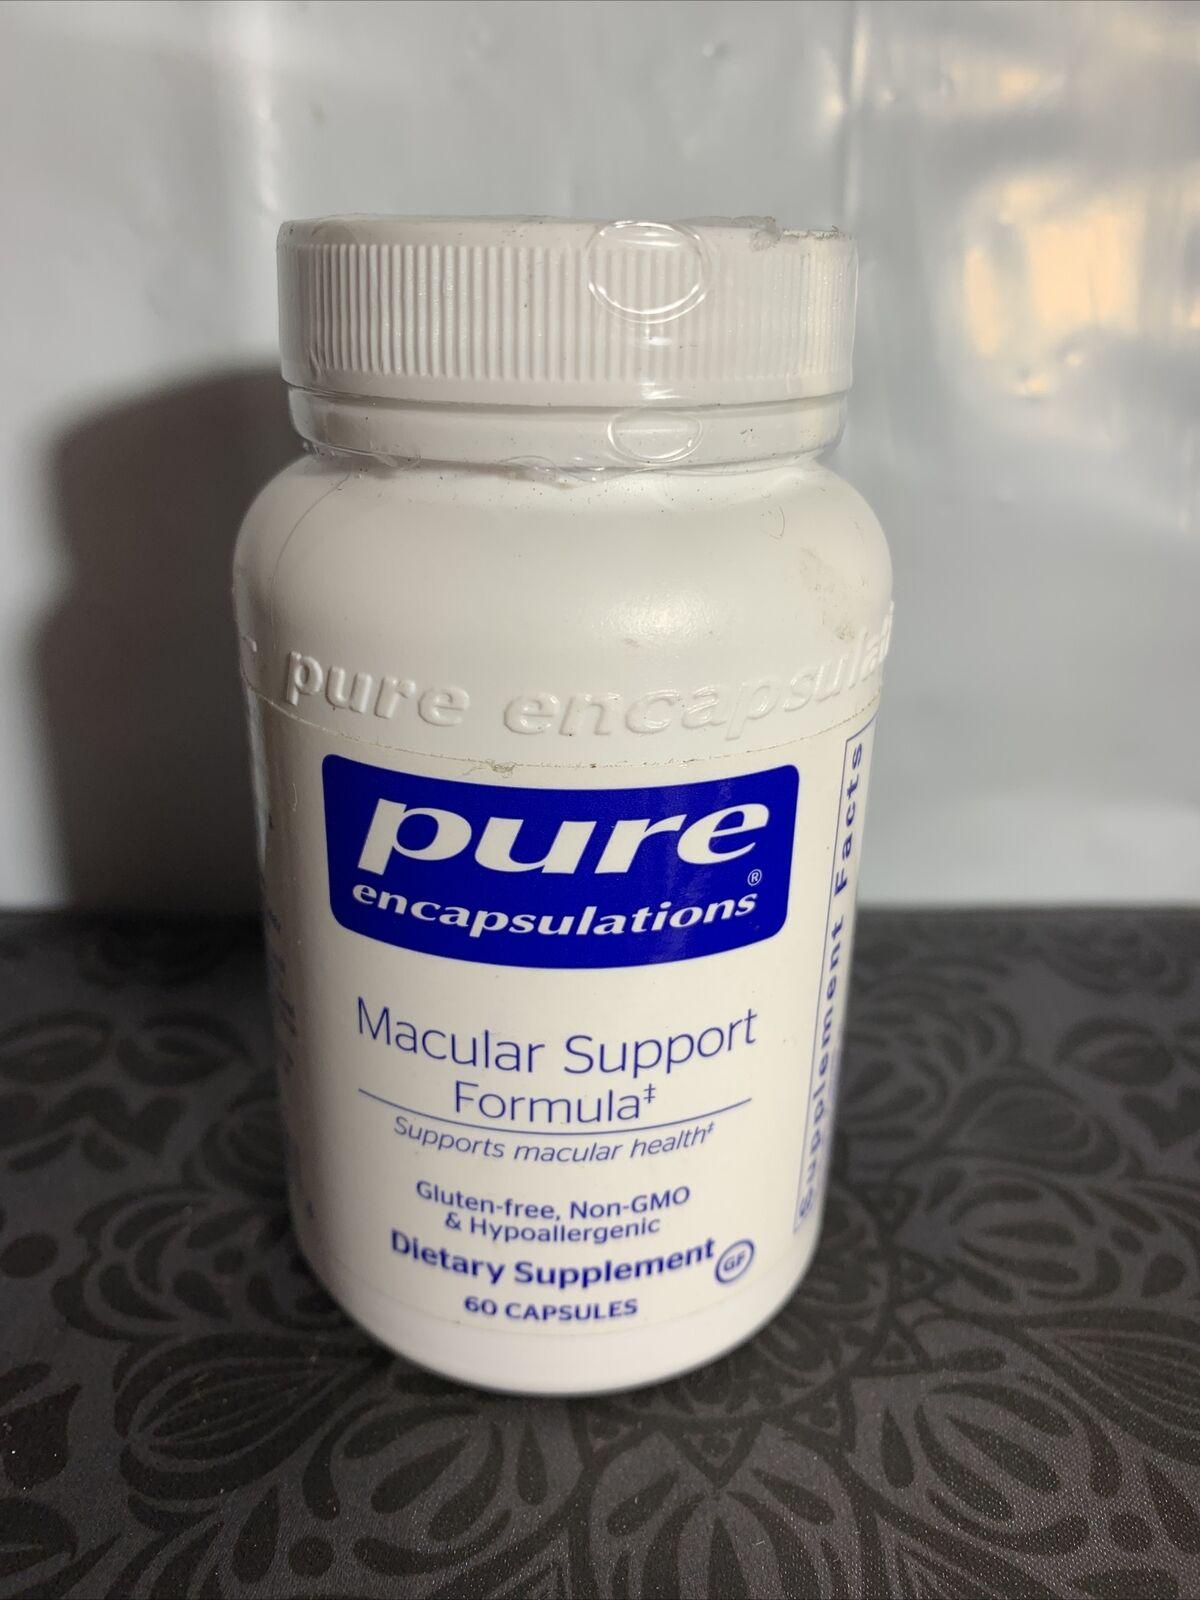 Pure Encapsulations - Macular Support Formula Hypoallergenic Supplement 60 Caps